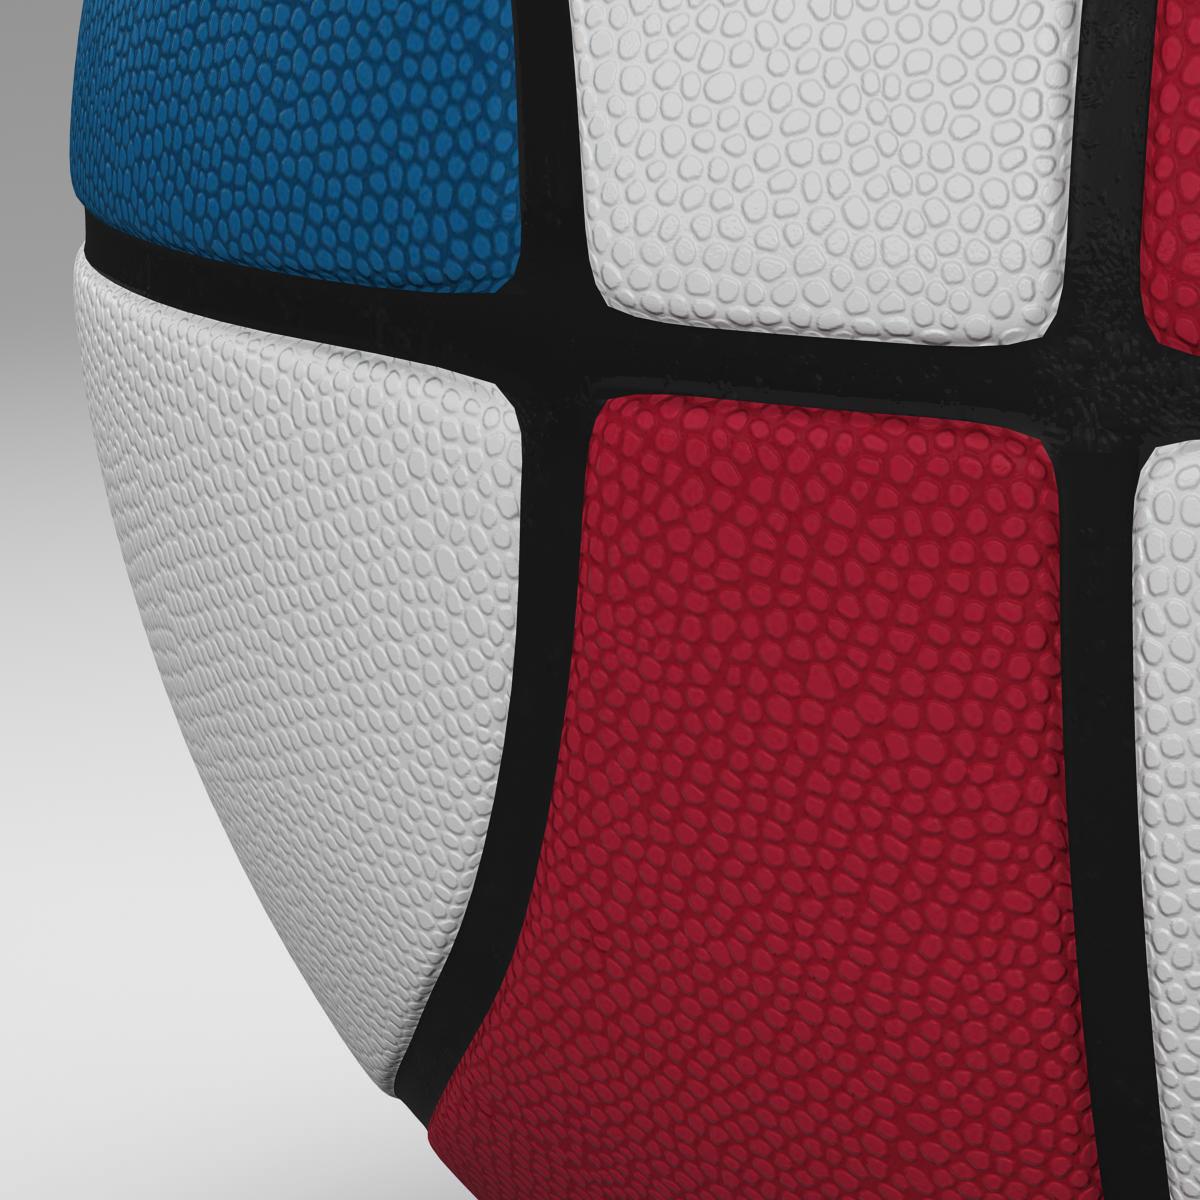 tricolor basketball ball 3d model 3ds max fbx c4d ma mb obj 164852